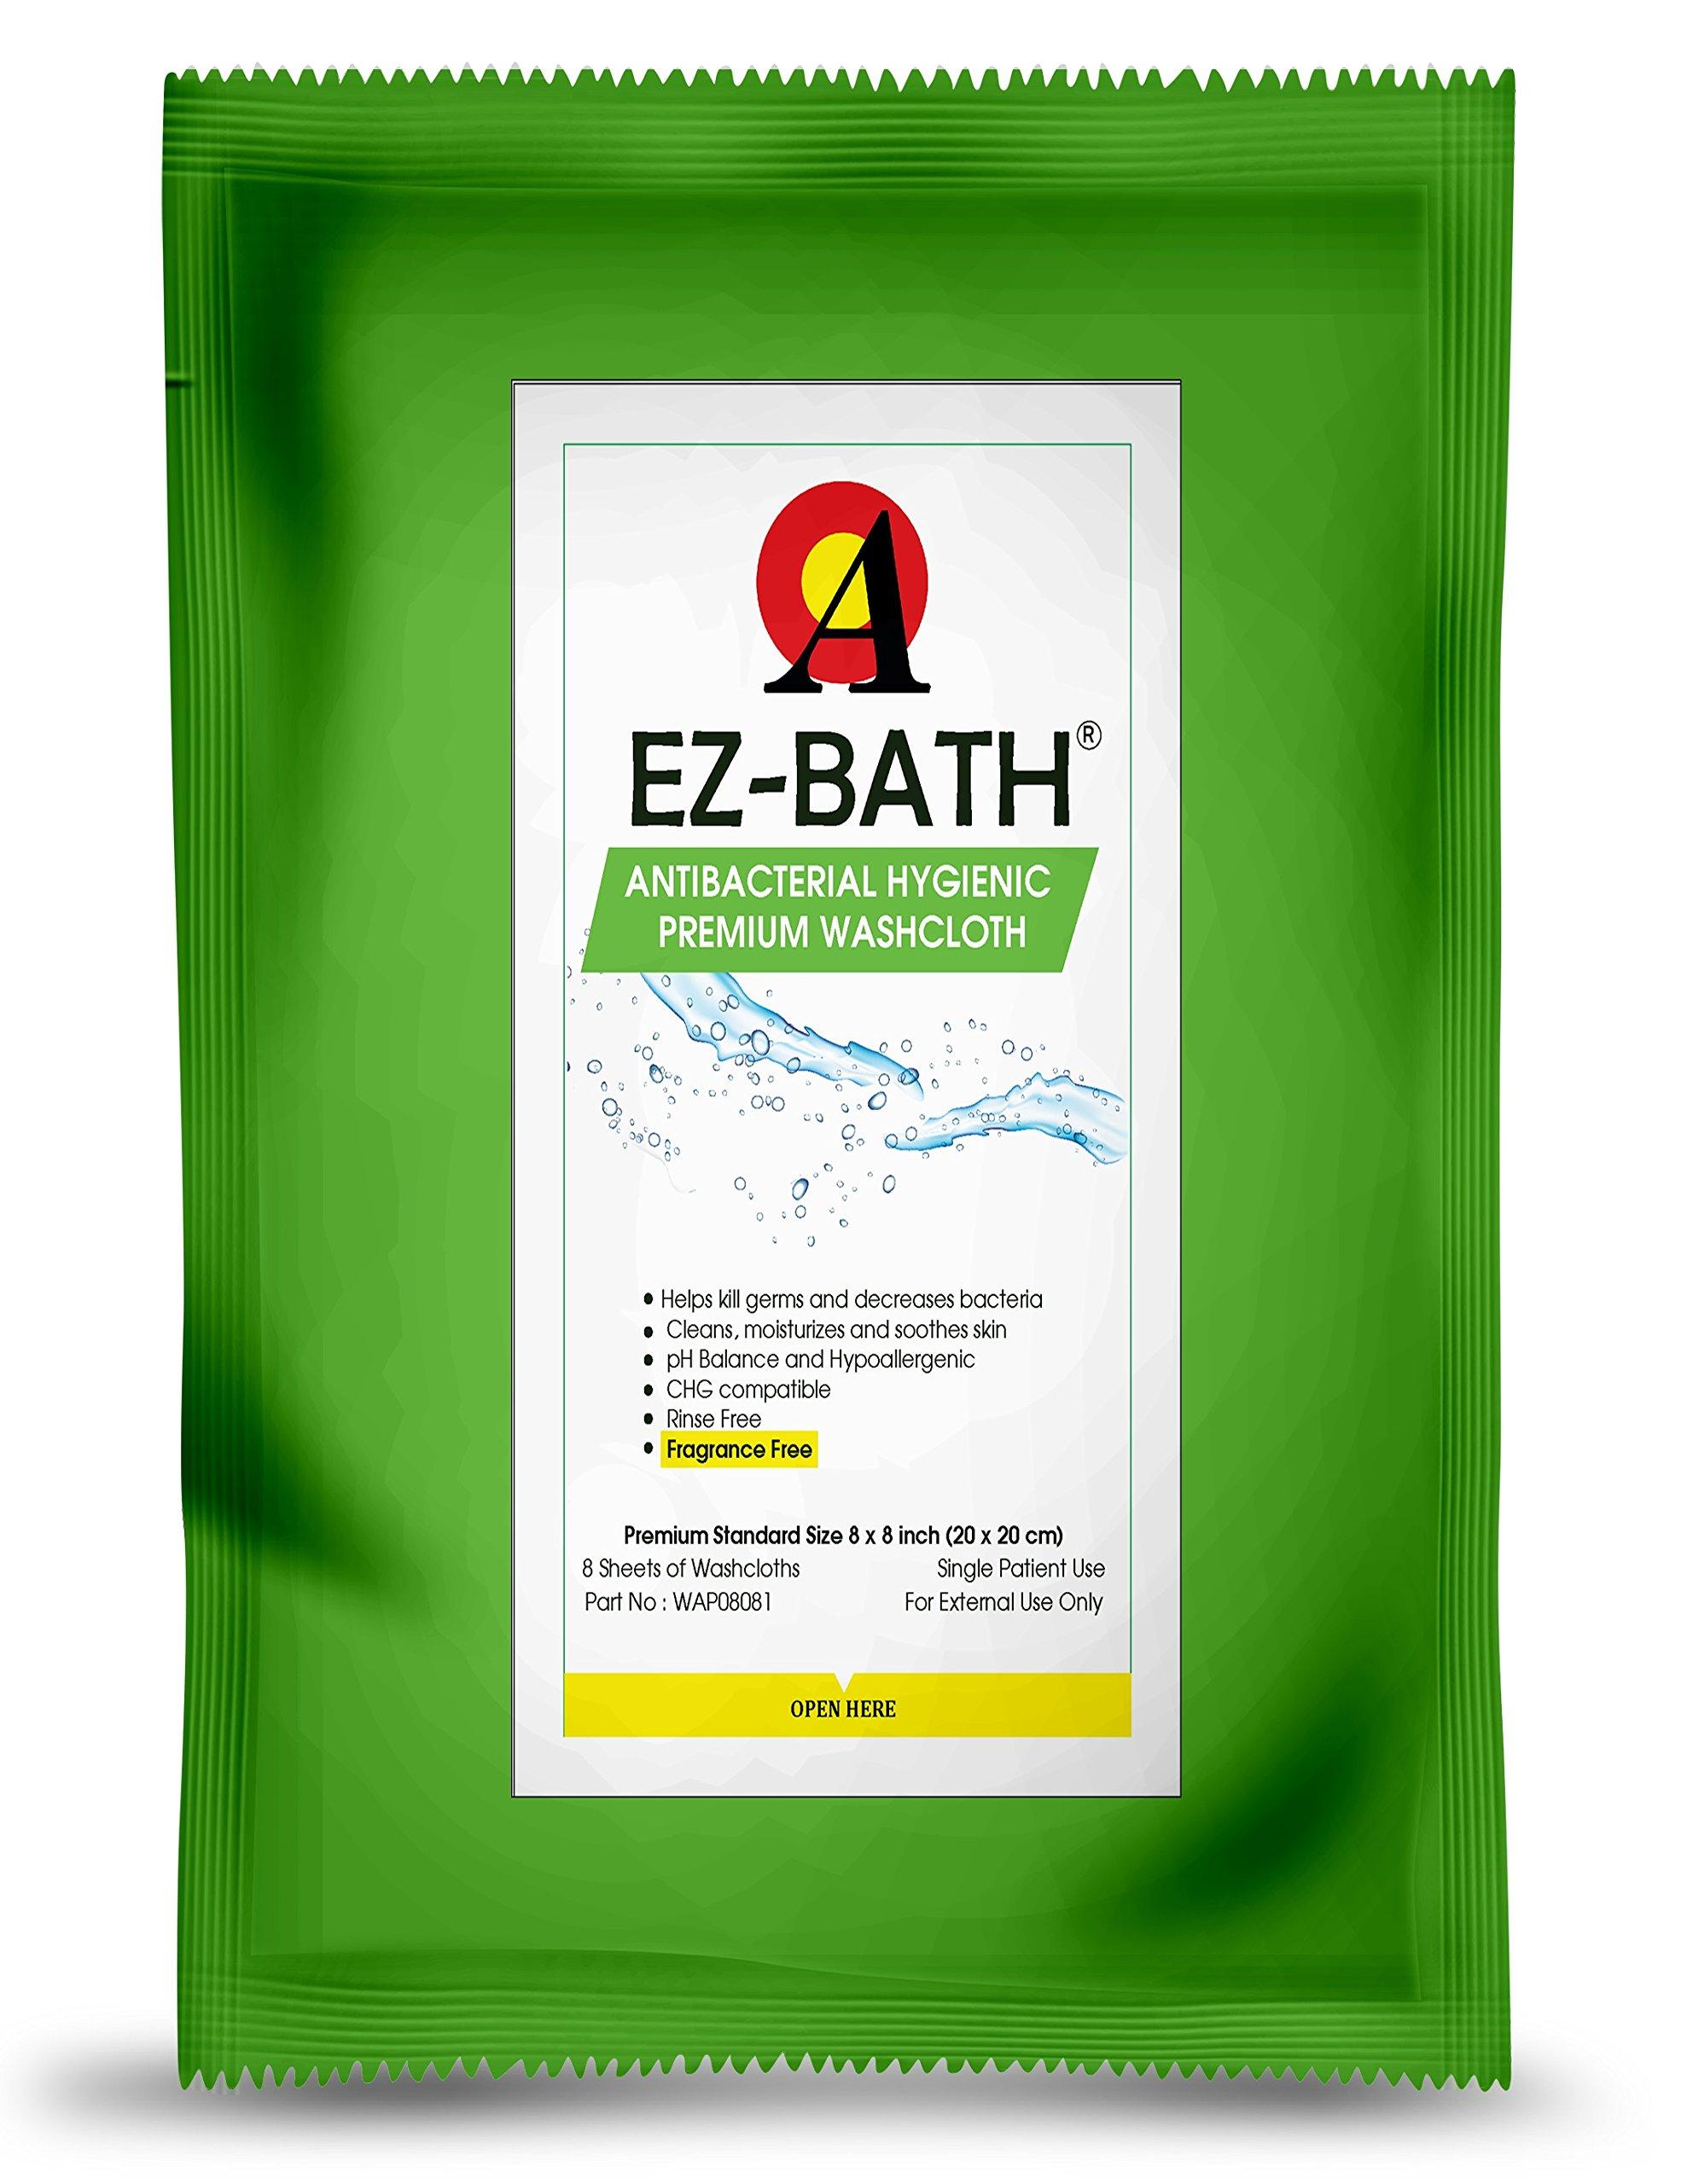 Antibacterial Body Washcloth, Unscented, Hygienic pH Balance(8 Sheets-14 Packs)